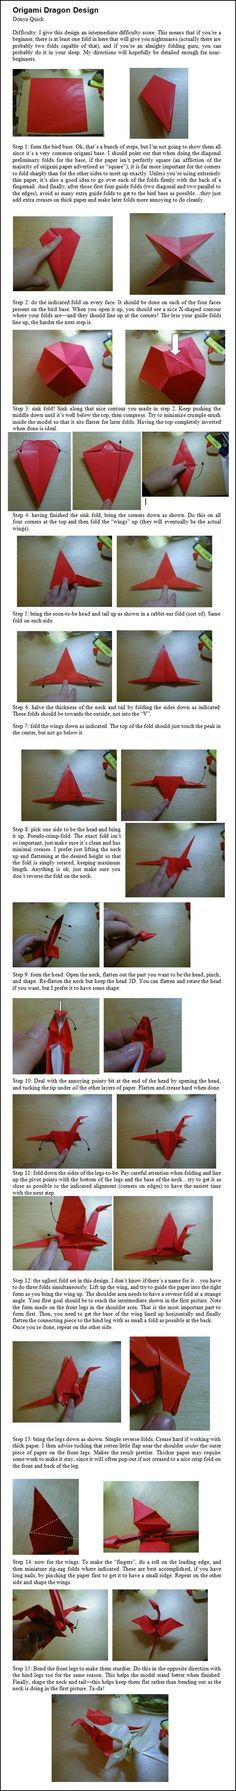 Origami Diagrams Embroidery Origami Http Jewswar Com 12 Dragon Origami